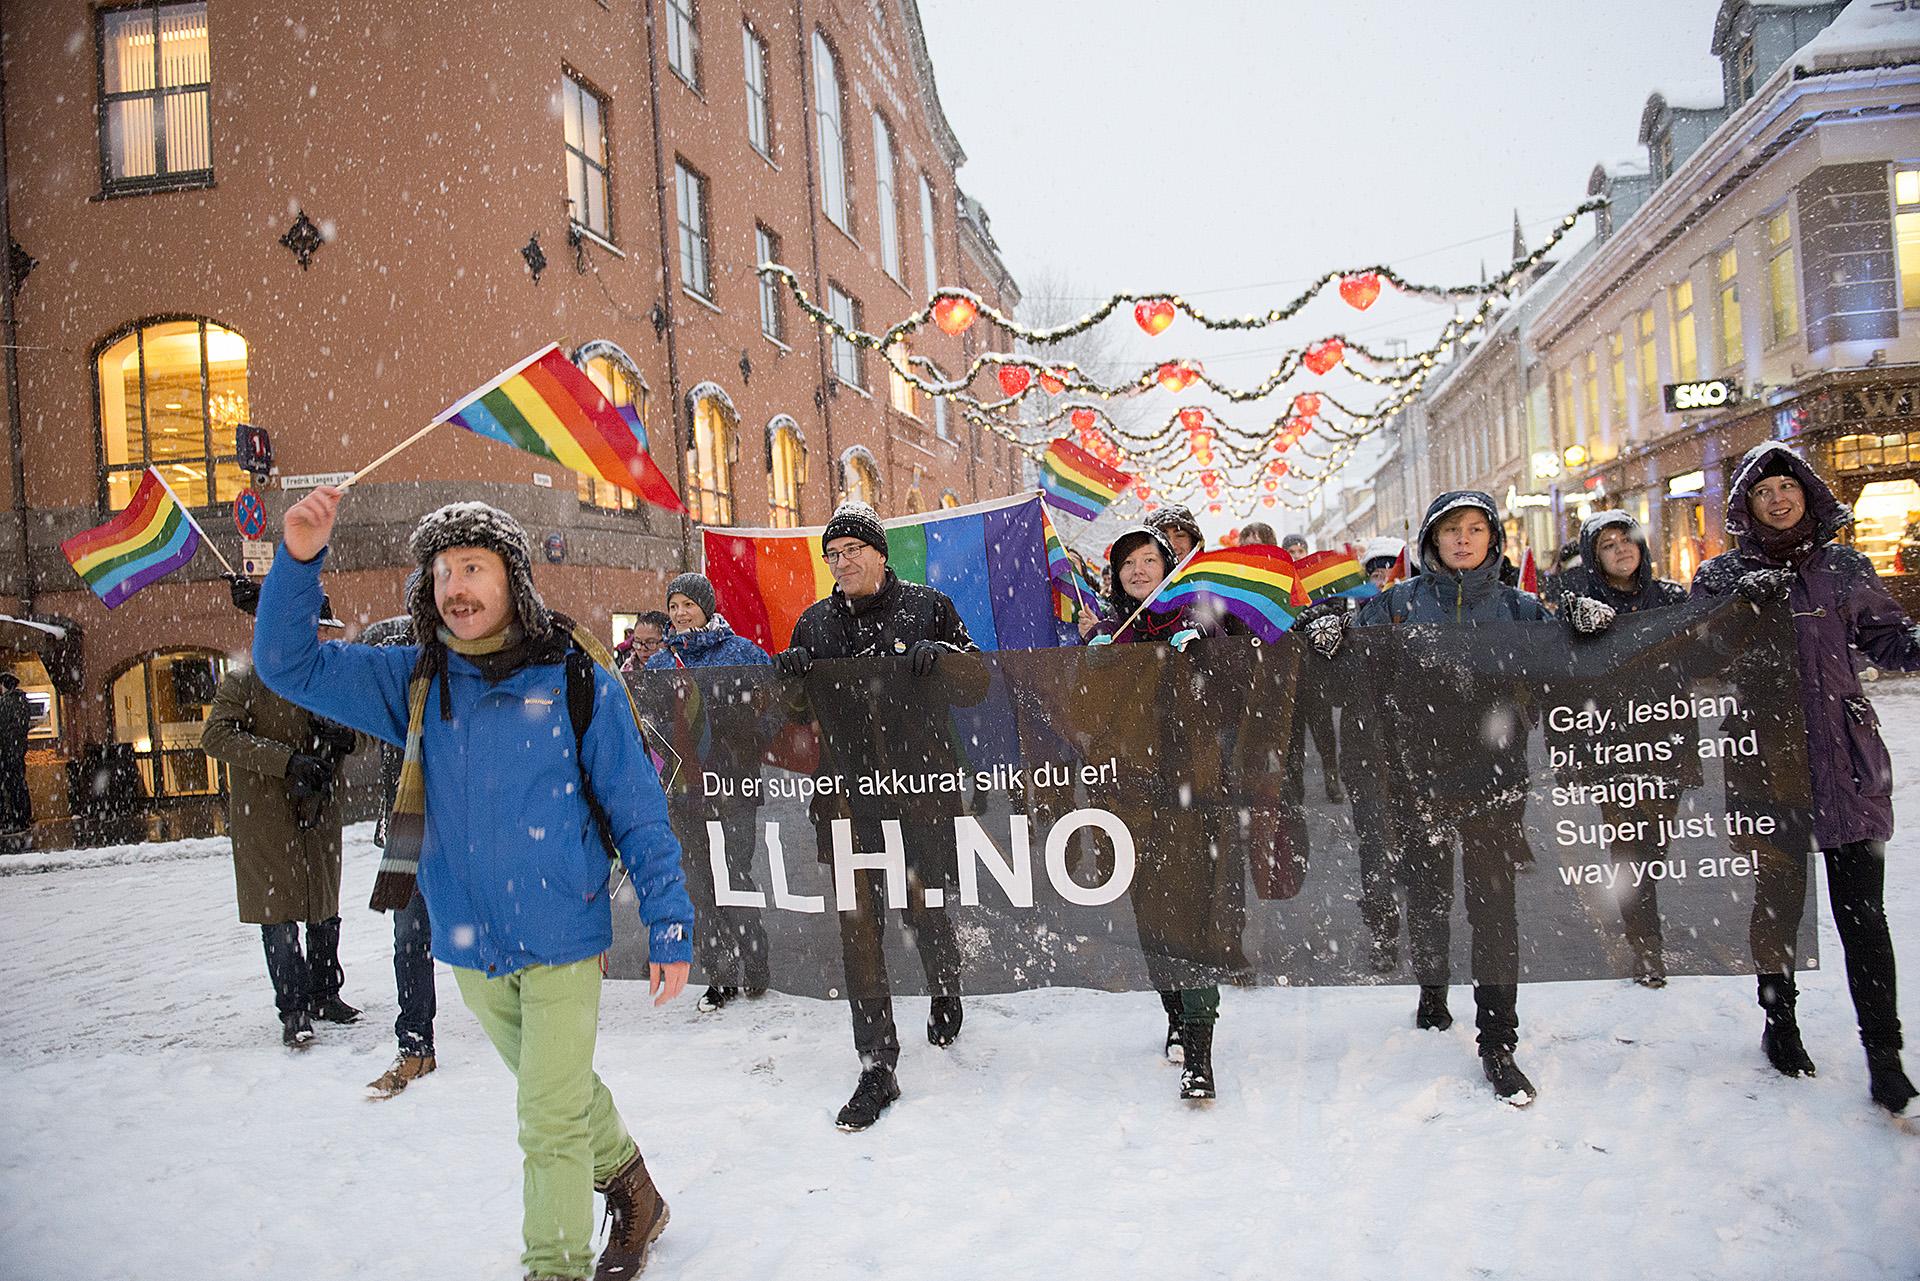 320 fargerike mennesker deltok i paraden under Tromsø Arctic Pride.